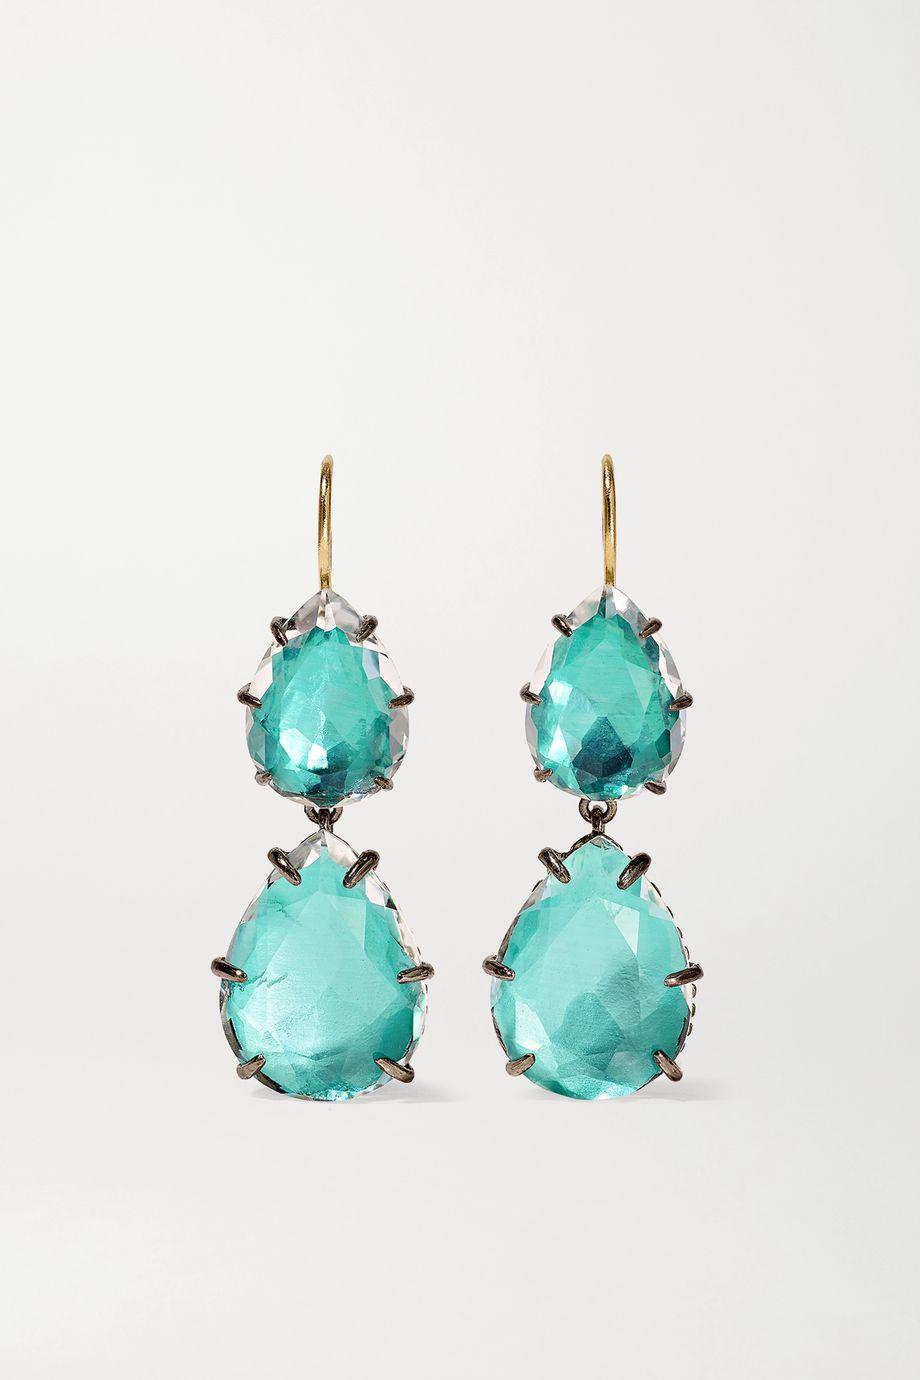 Larkspur & Hawk Caterina Large Double rhodium-dipped quartz earrings